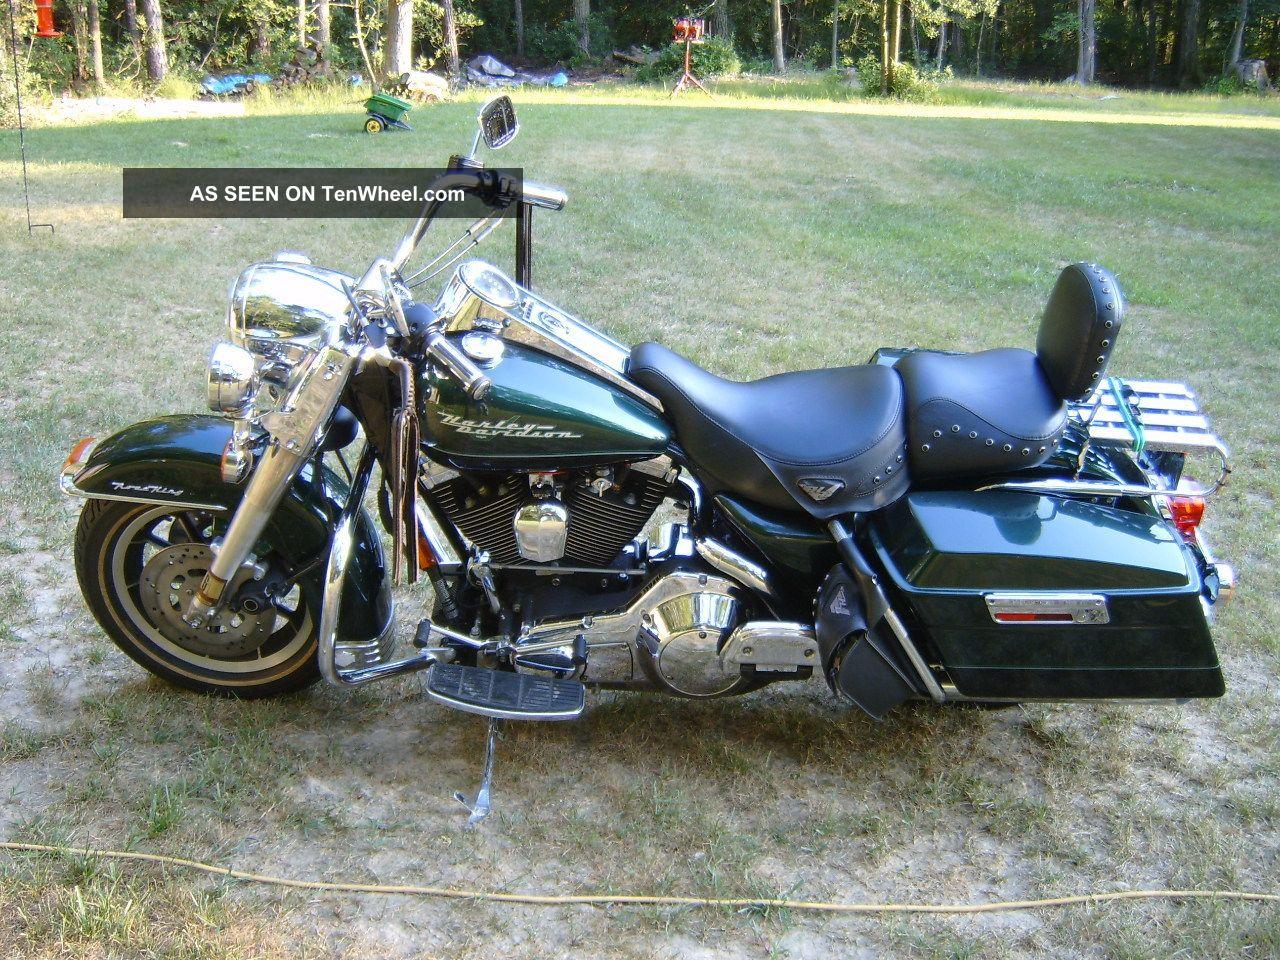 1996 Harley Road King Parts Diagram Best Secret Wiring Evo Motorcycle Engine Davidson Dyna 1340 1987 2004 Headlight Assembly